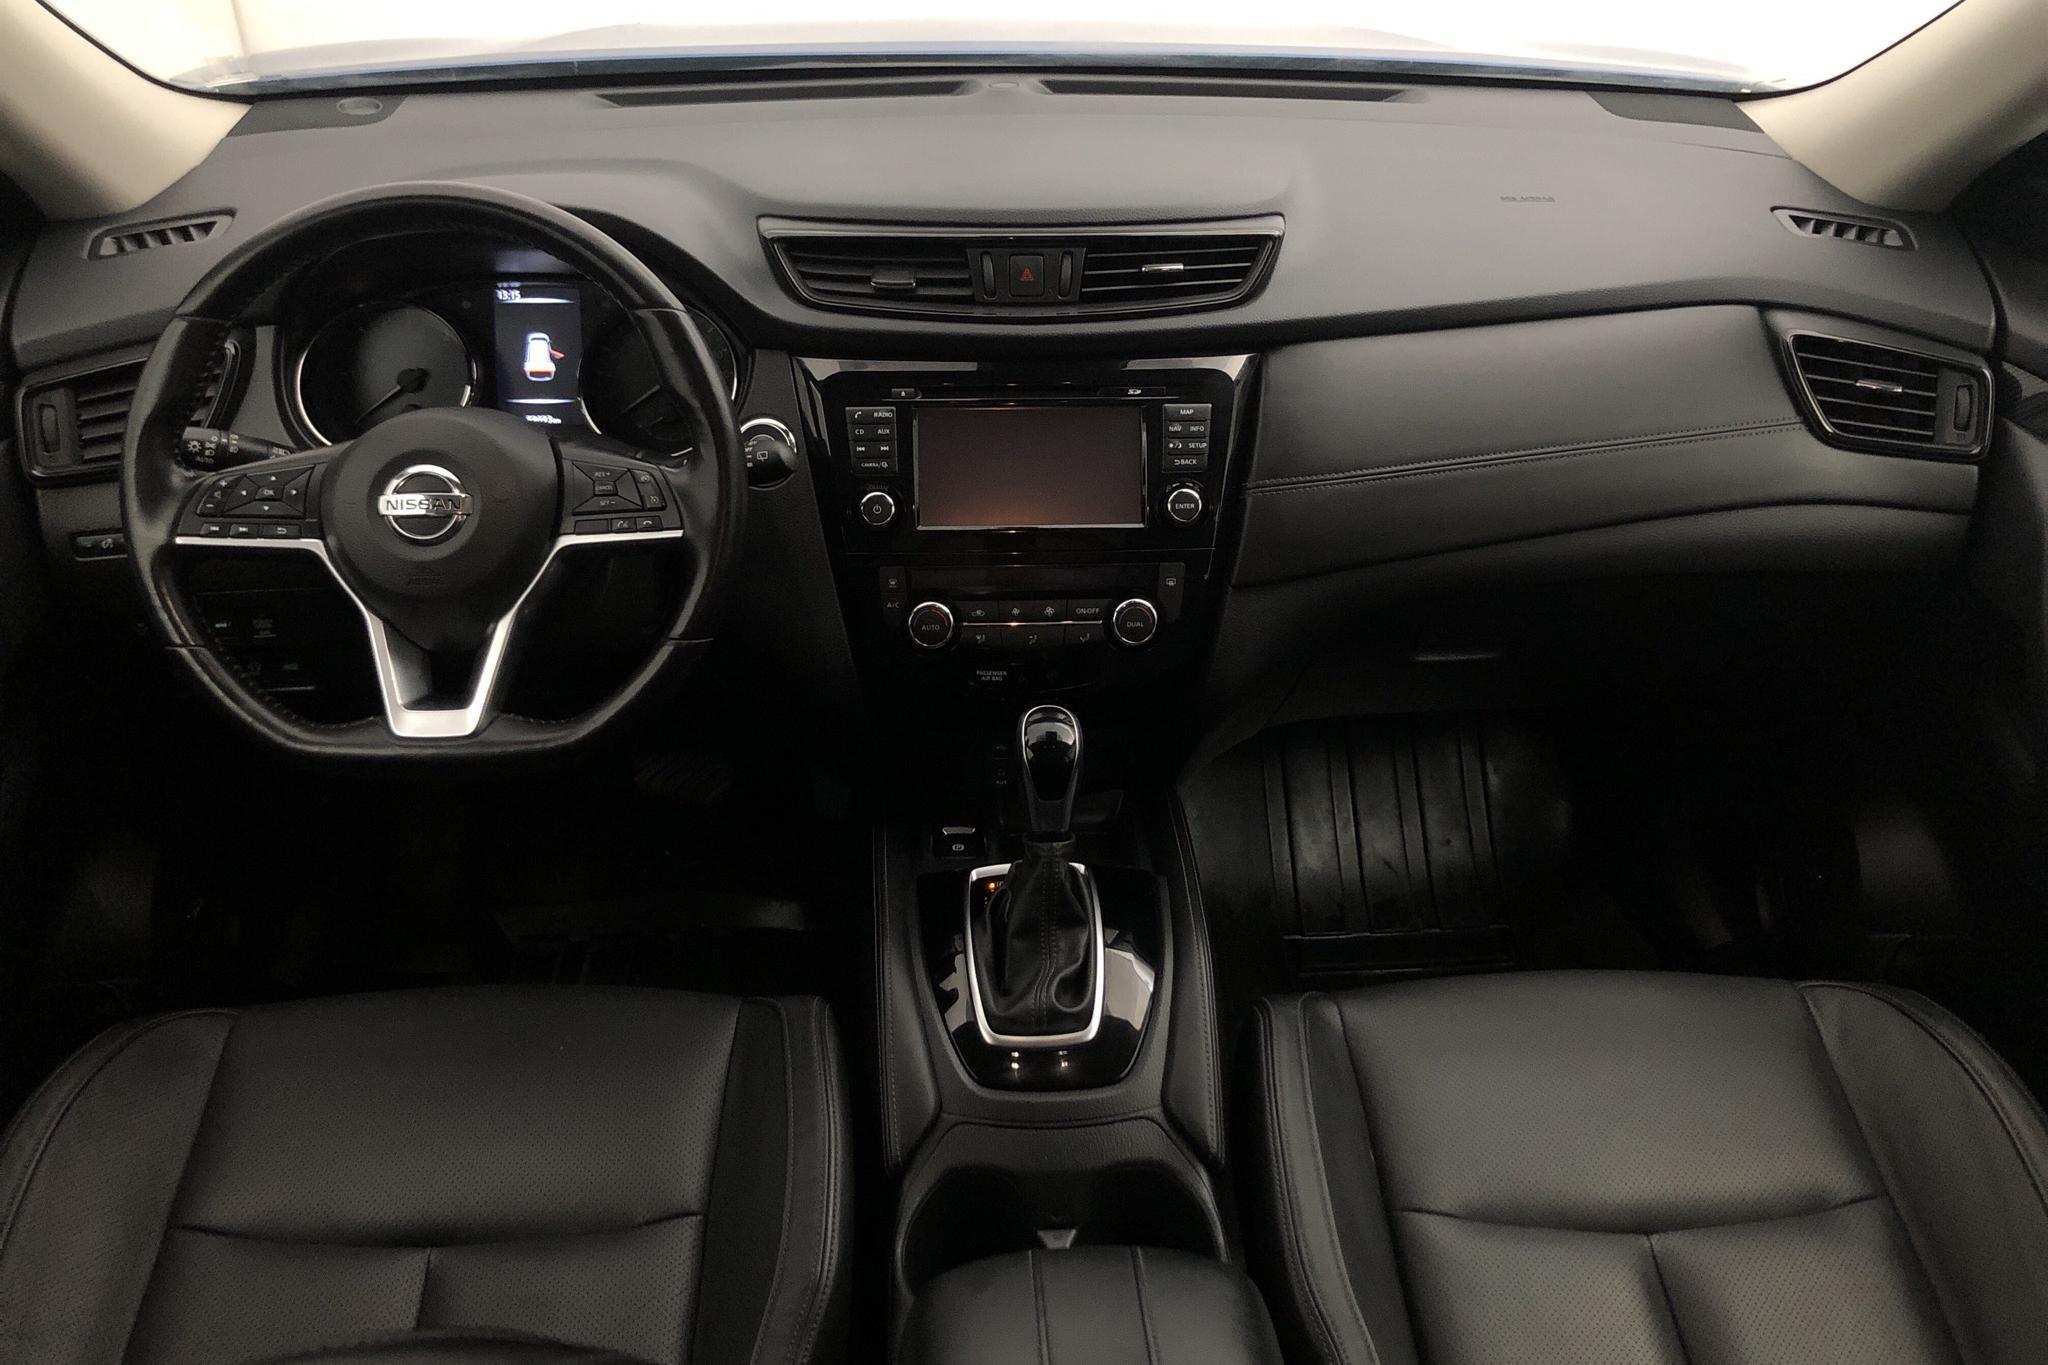 Nissan X-trail 1.6 dCi 2WD (130hk) - 59 680 km - Automatic - blue - 2017